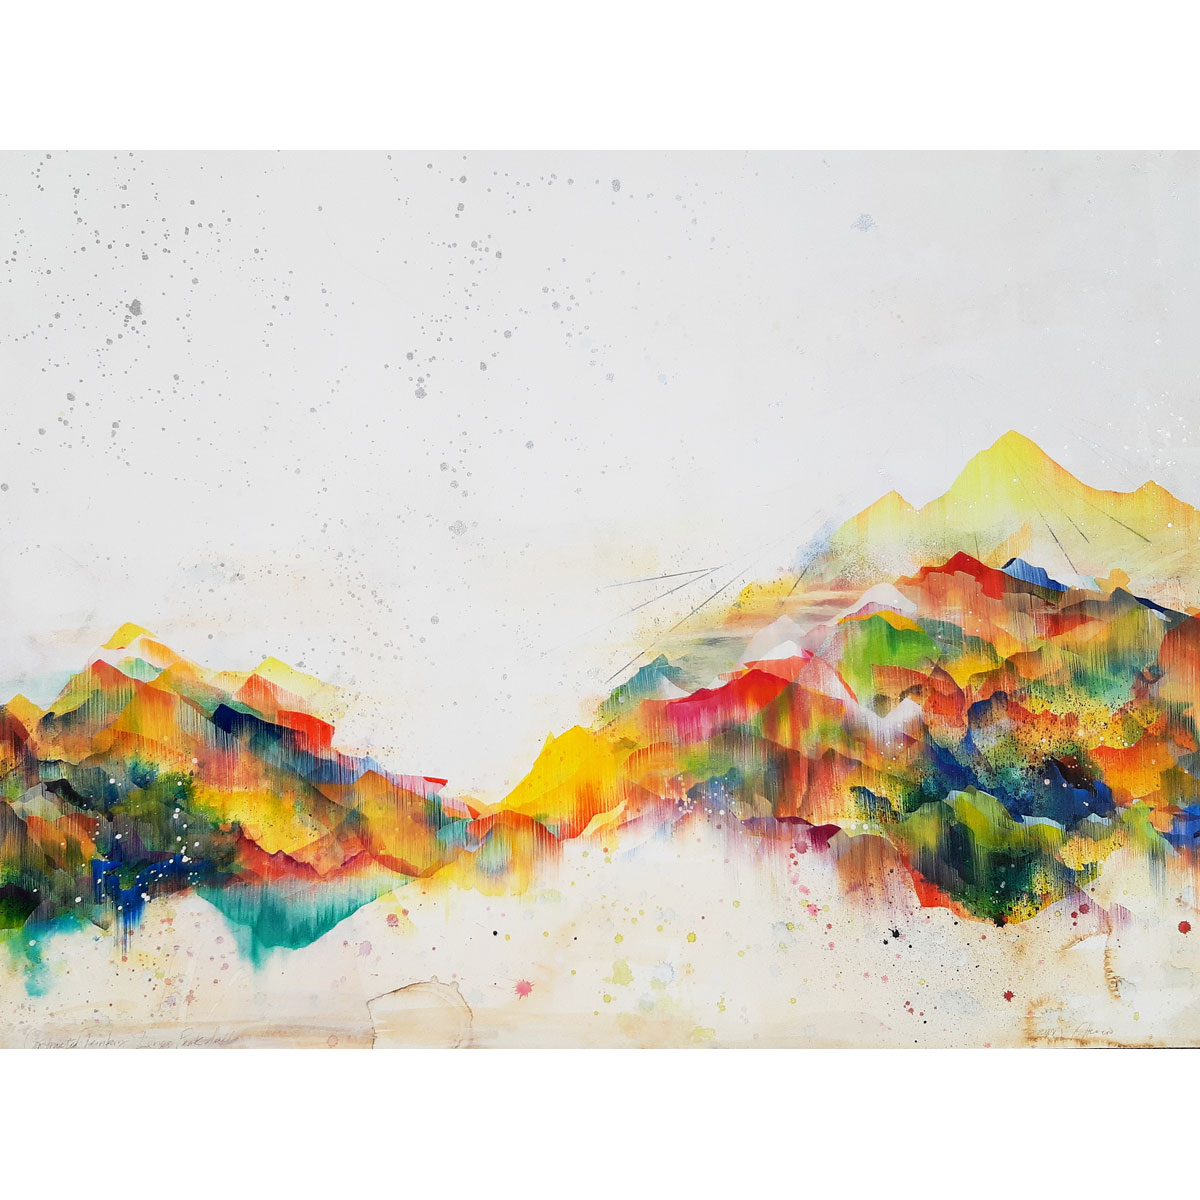 Longs Peak by Fawn Atencio